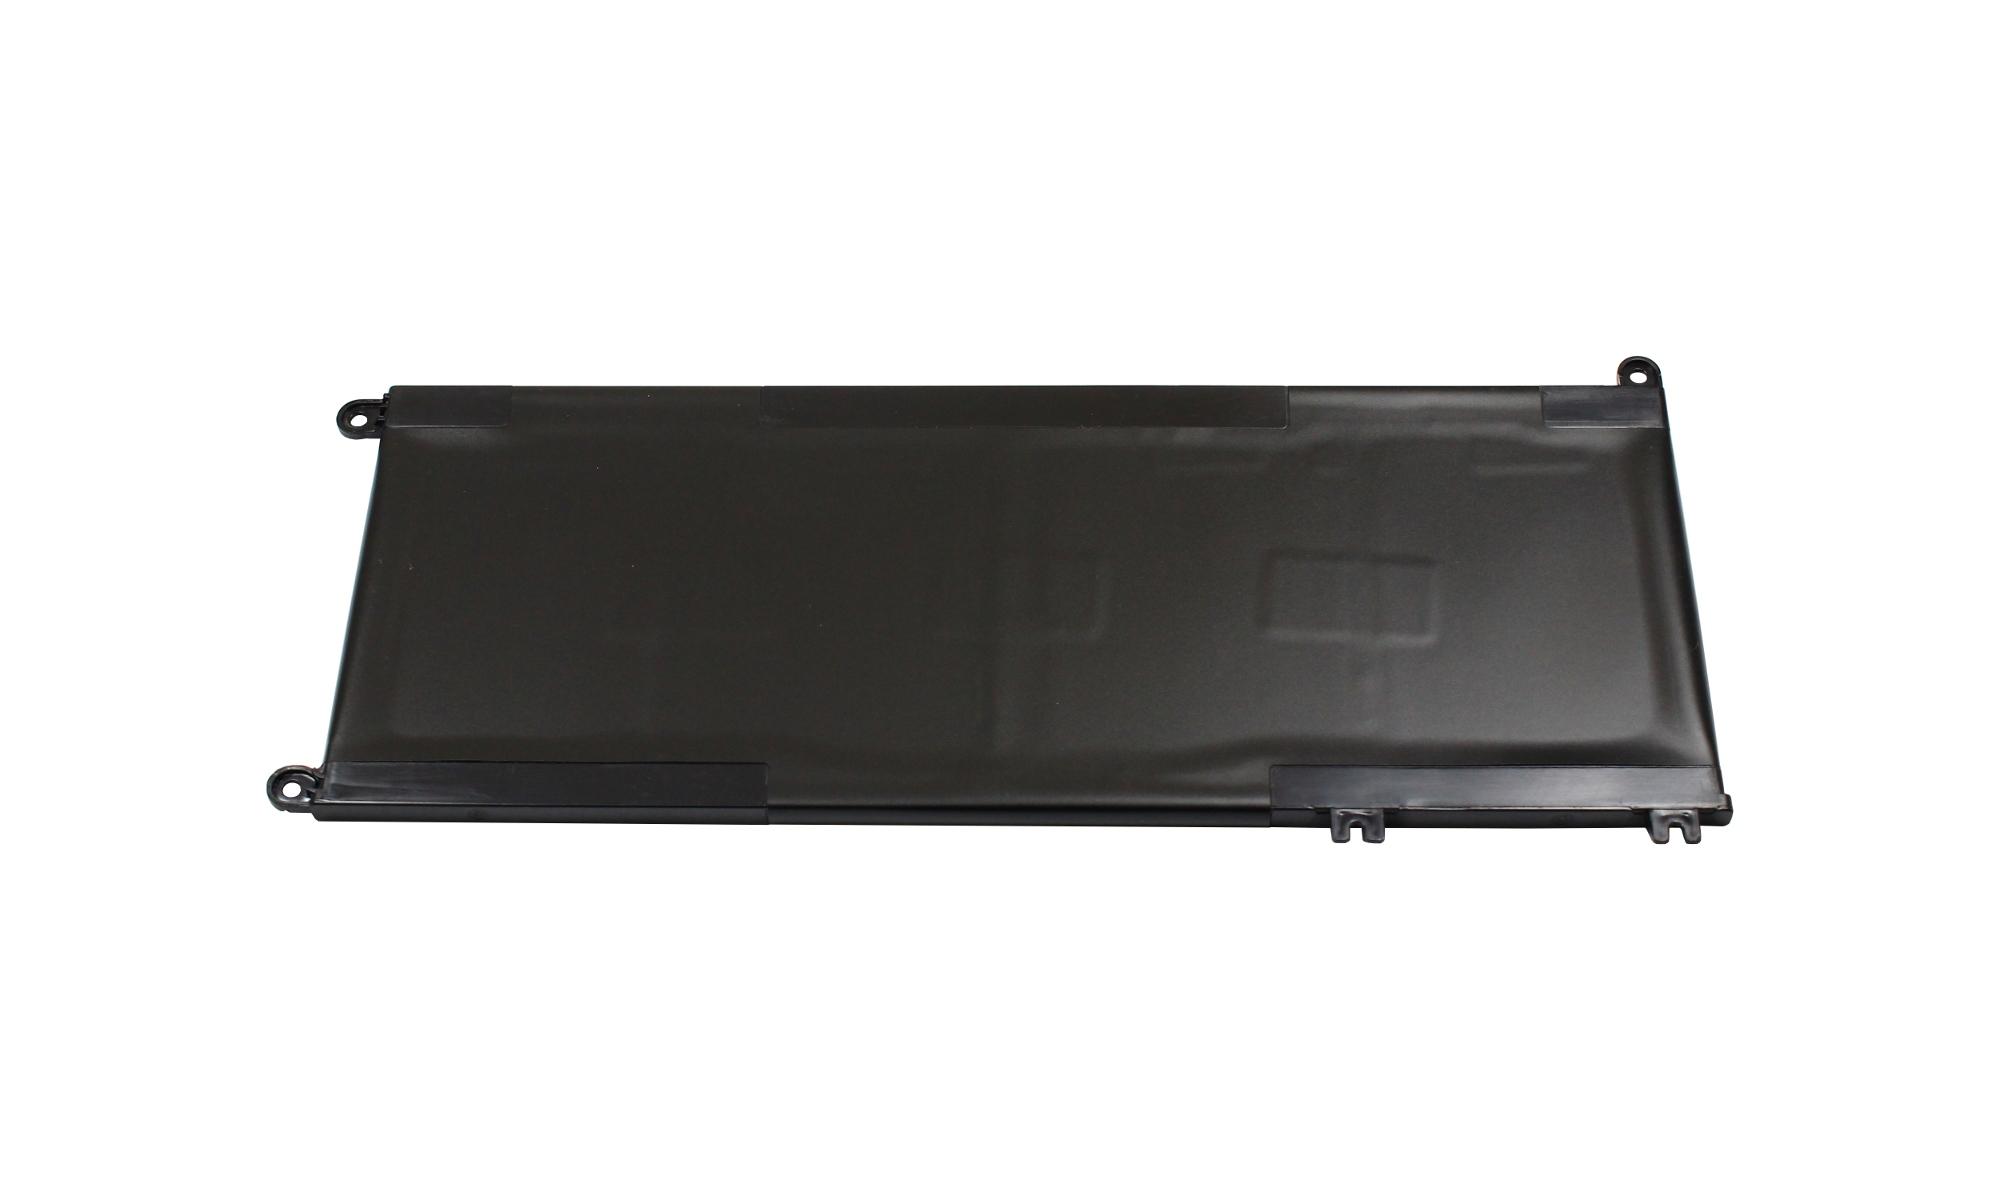 Baterie originala Dell Inspiron 7786, 56Wh 4 celule